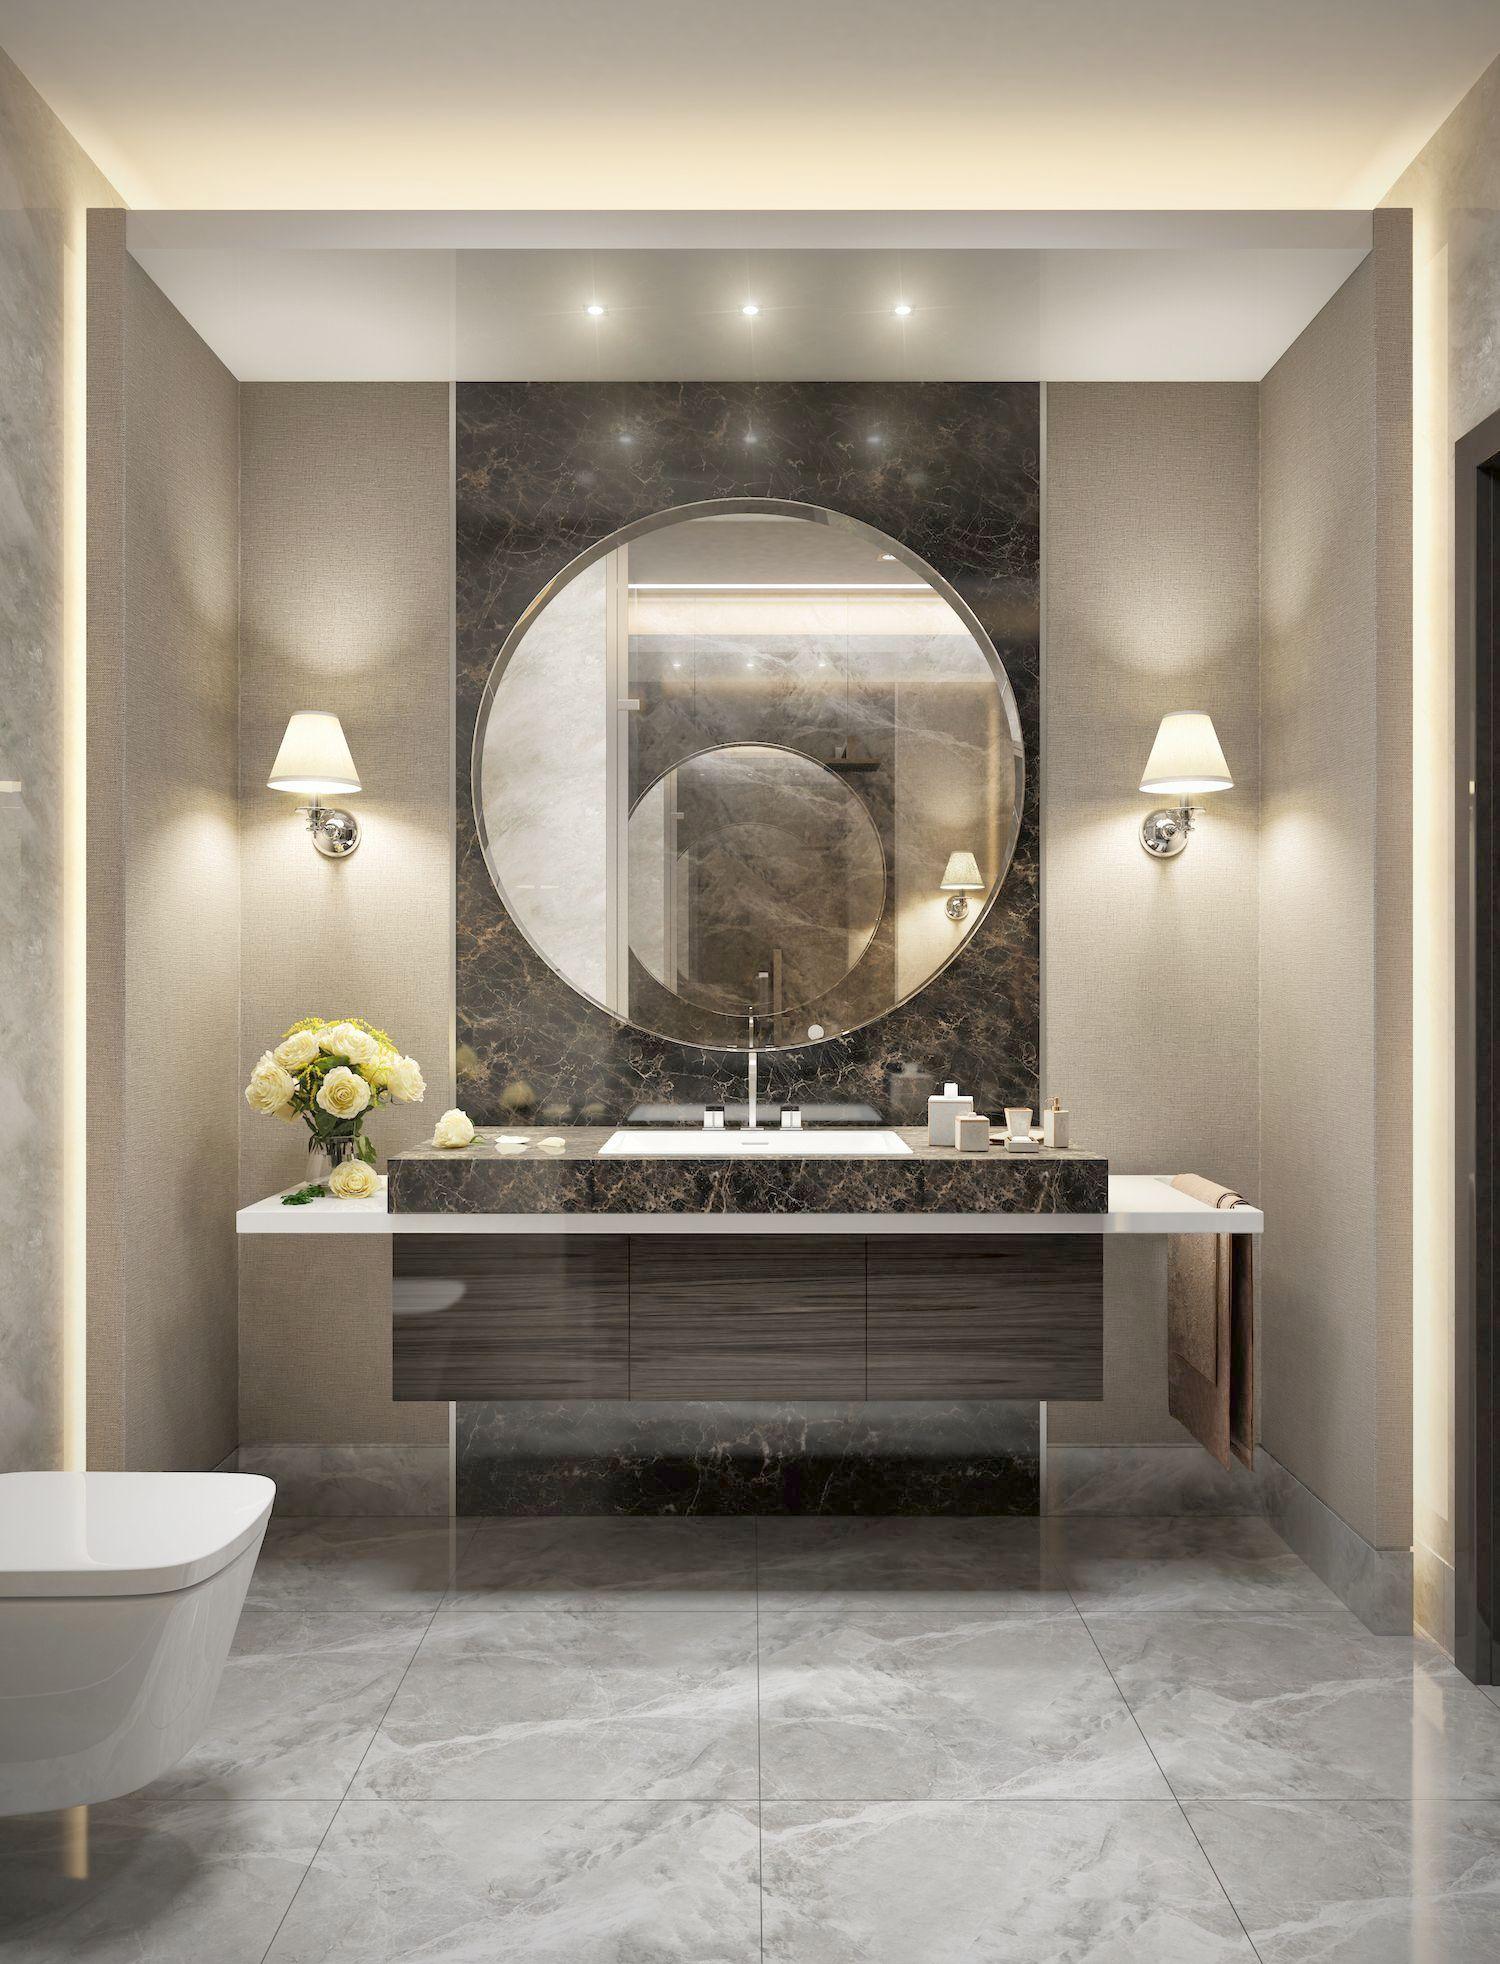 Bathroom Decor Next Bathroom Interior Design Houston Washroom Design,  Washroom Vanity, Hotel Bathroom Design